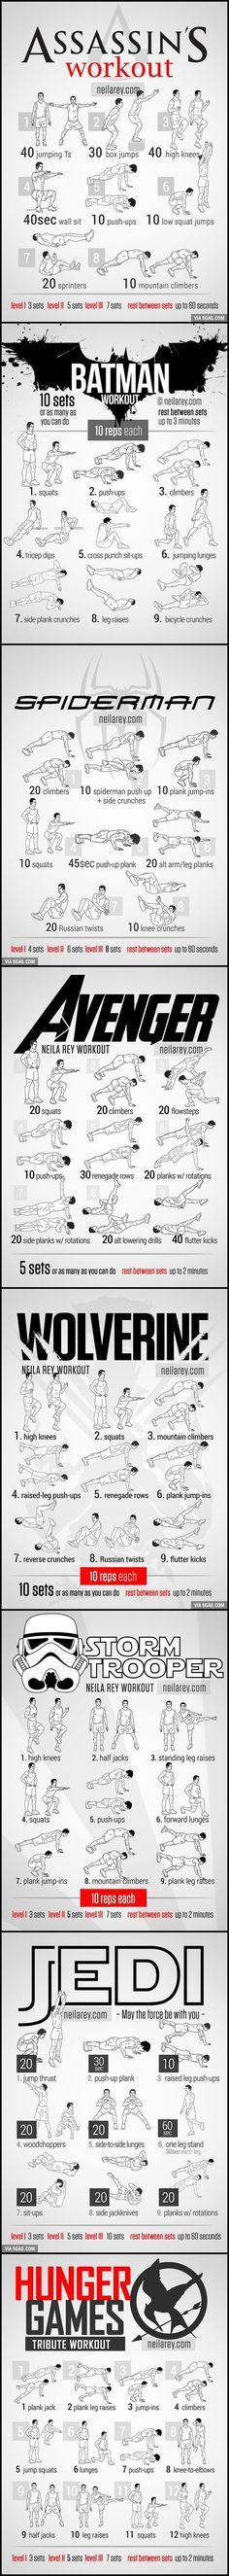 Super Heroes workout regimen.